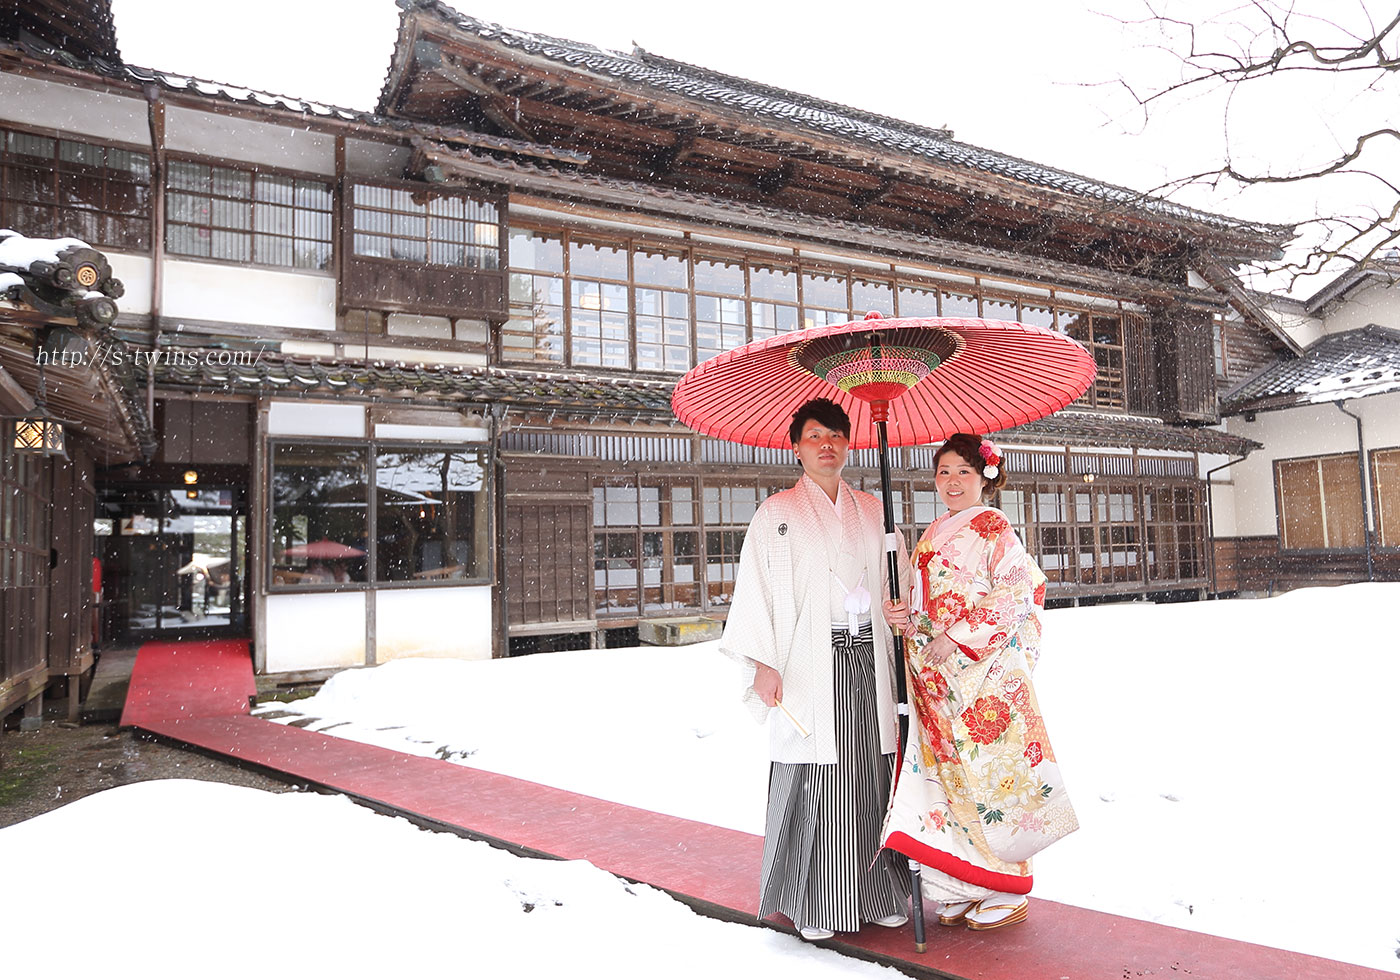 16feb27igarashitei_wedding02